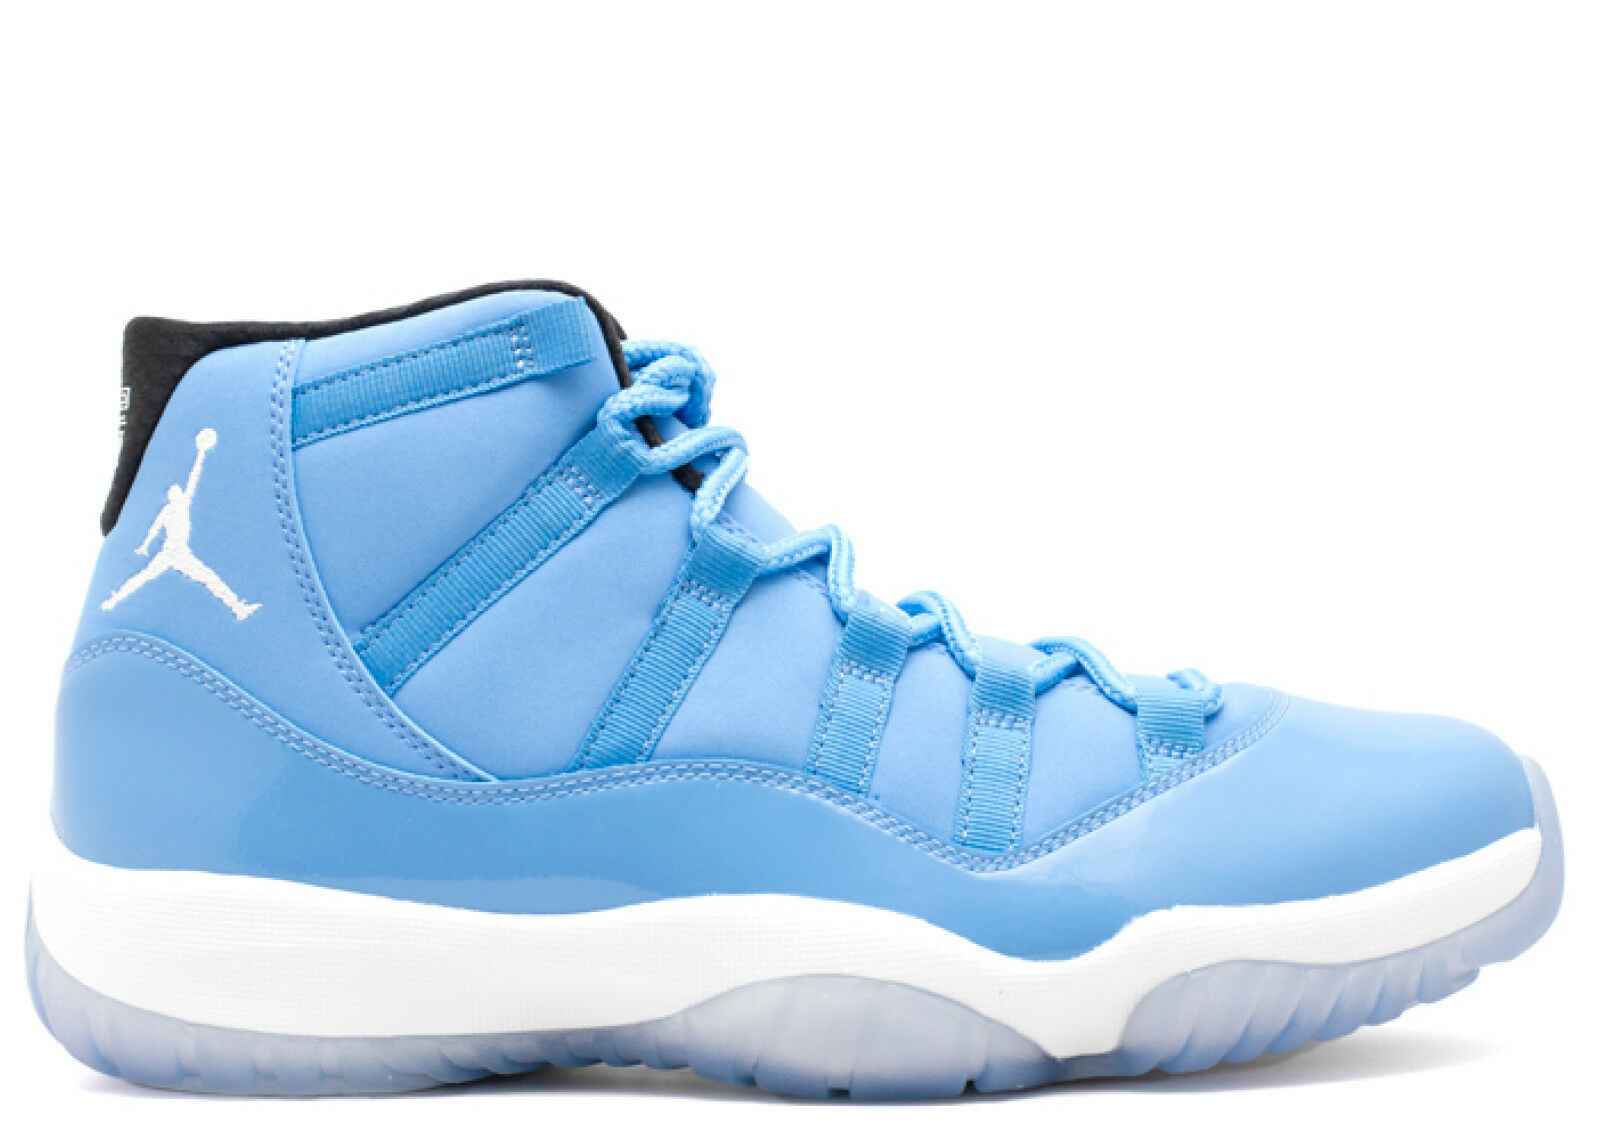 2014 Nike Air Jordan 11 XI Retro Pantone Gift of Flight Size 9. 689479-405 1 2